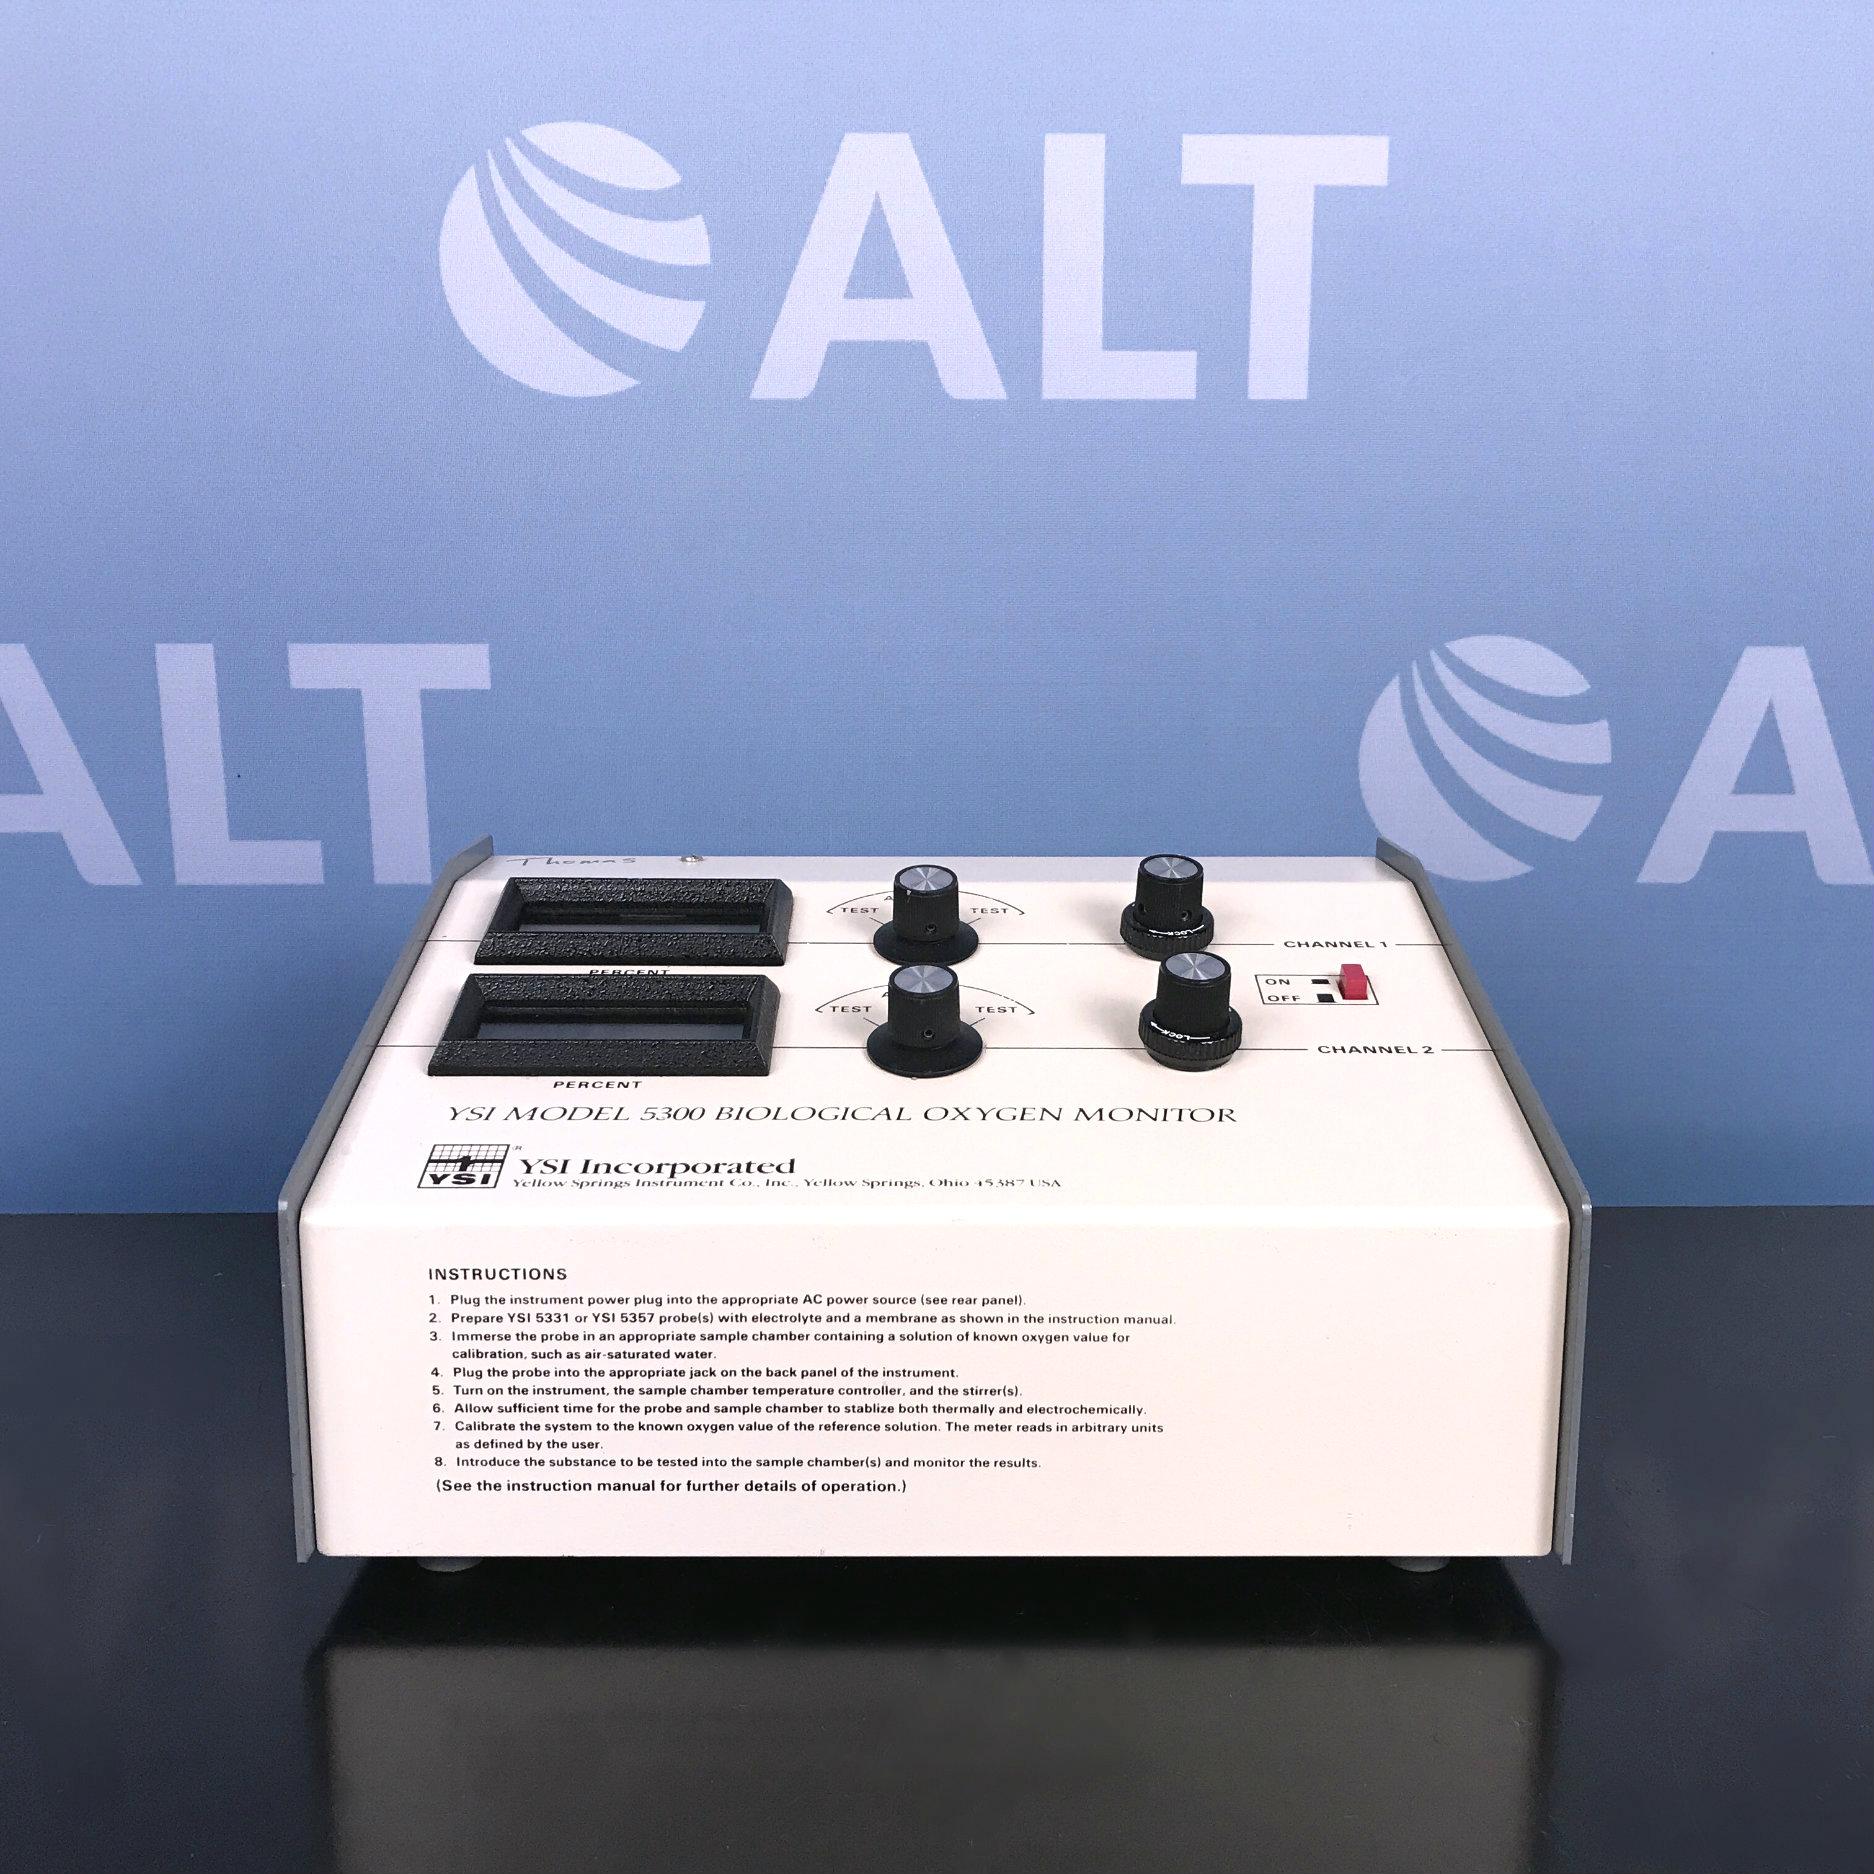 YSI Model 5300 Biological Oxygen Monitor  Image